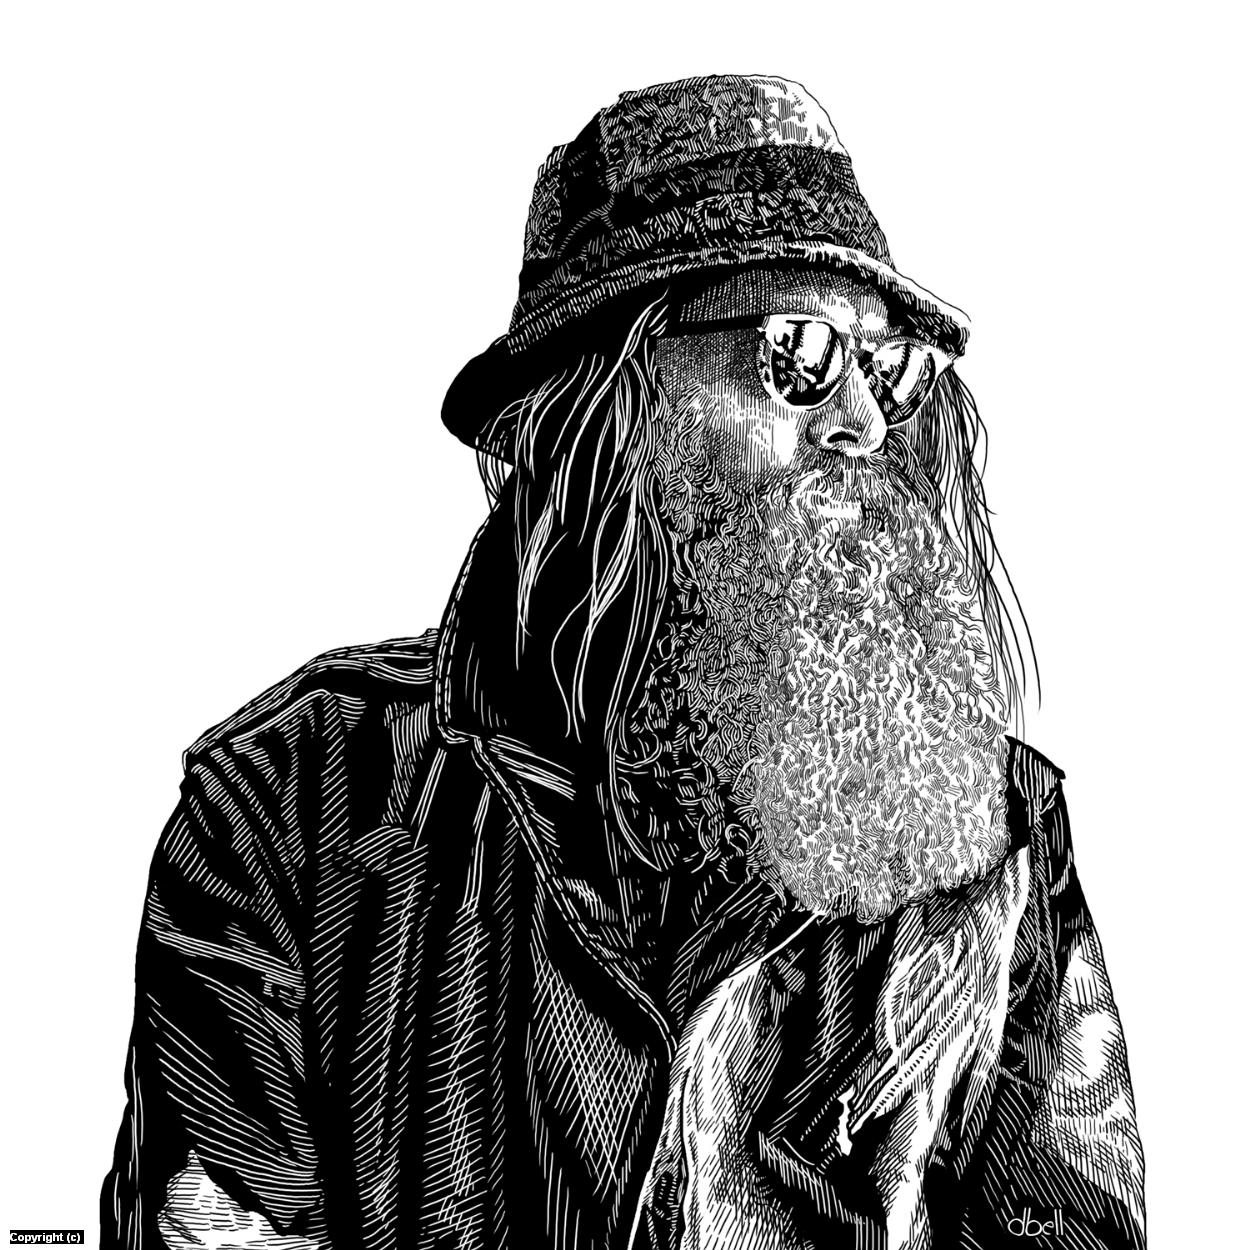 BR Wool Cap Artwork by Douglas Bell